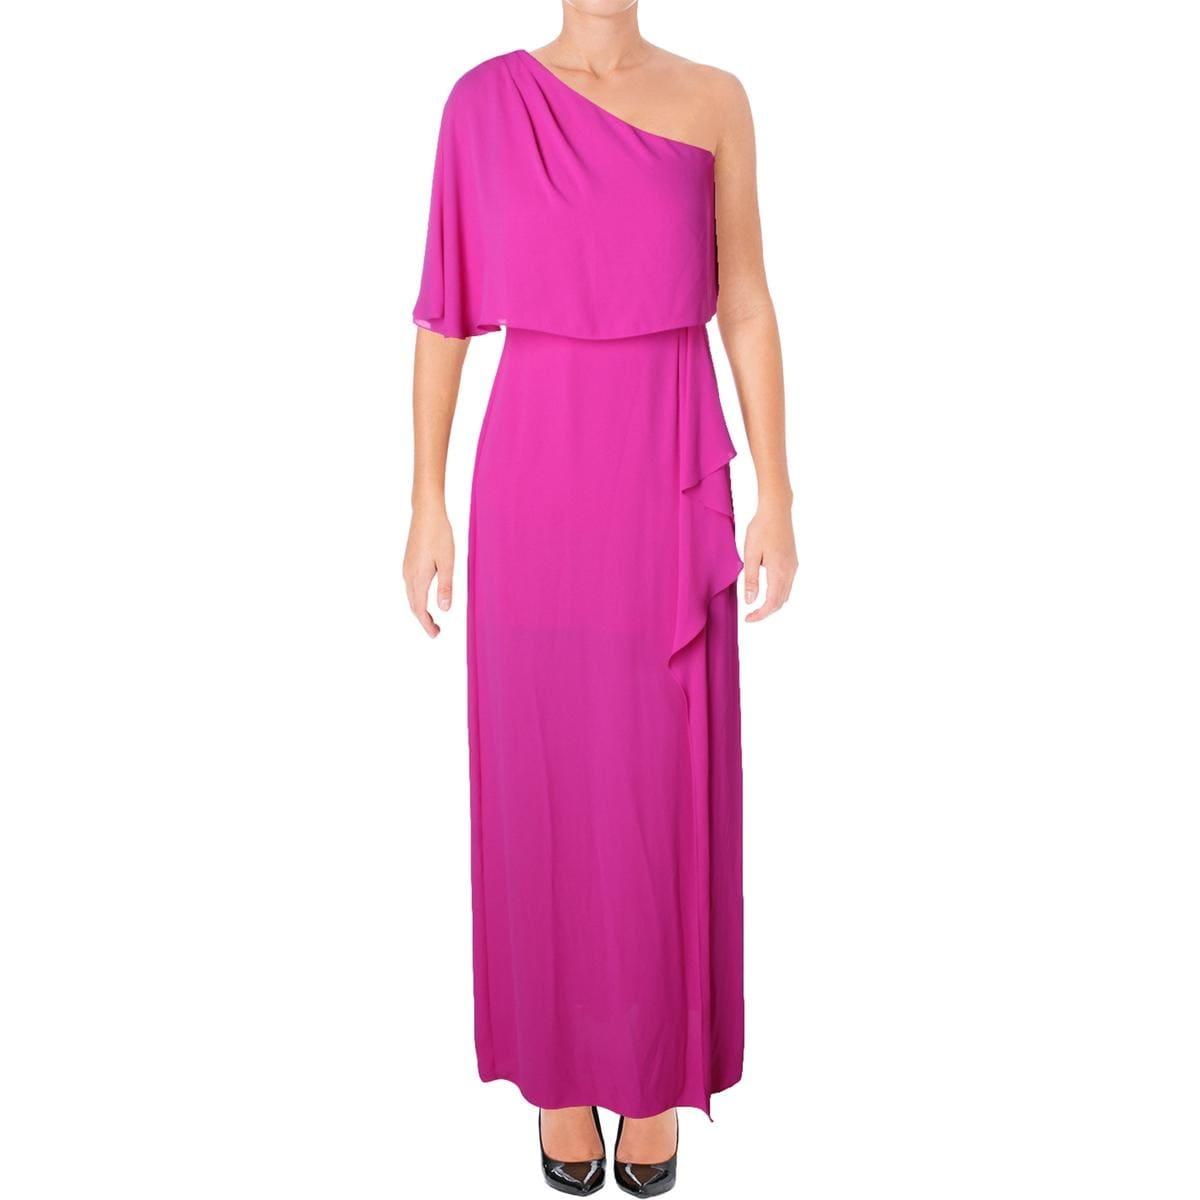 BCBG Max Azria Womens Semi-Formal Dress Chiffon One Shoulder - 2 ...